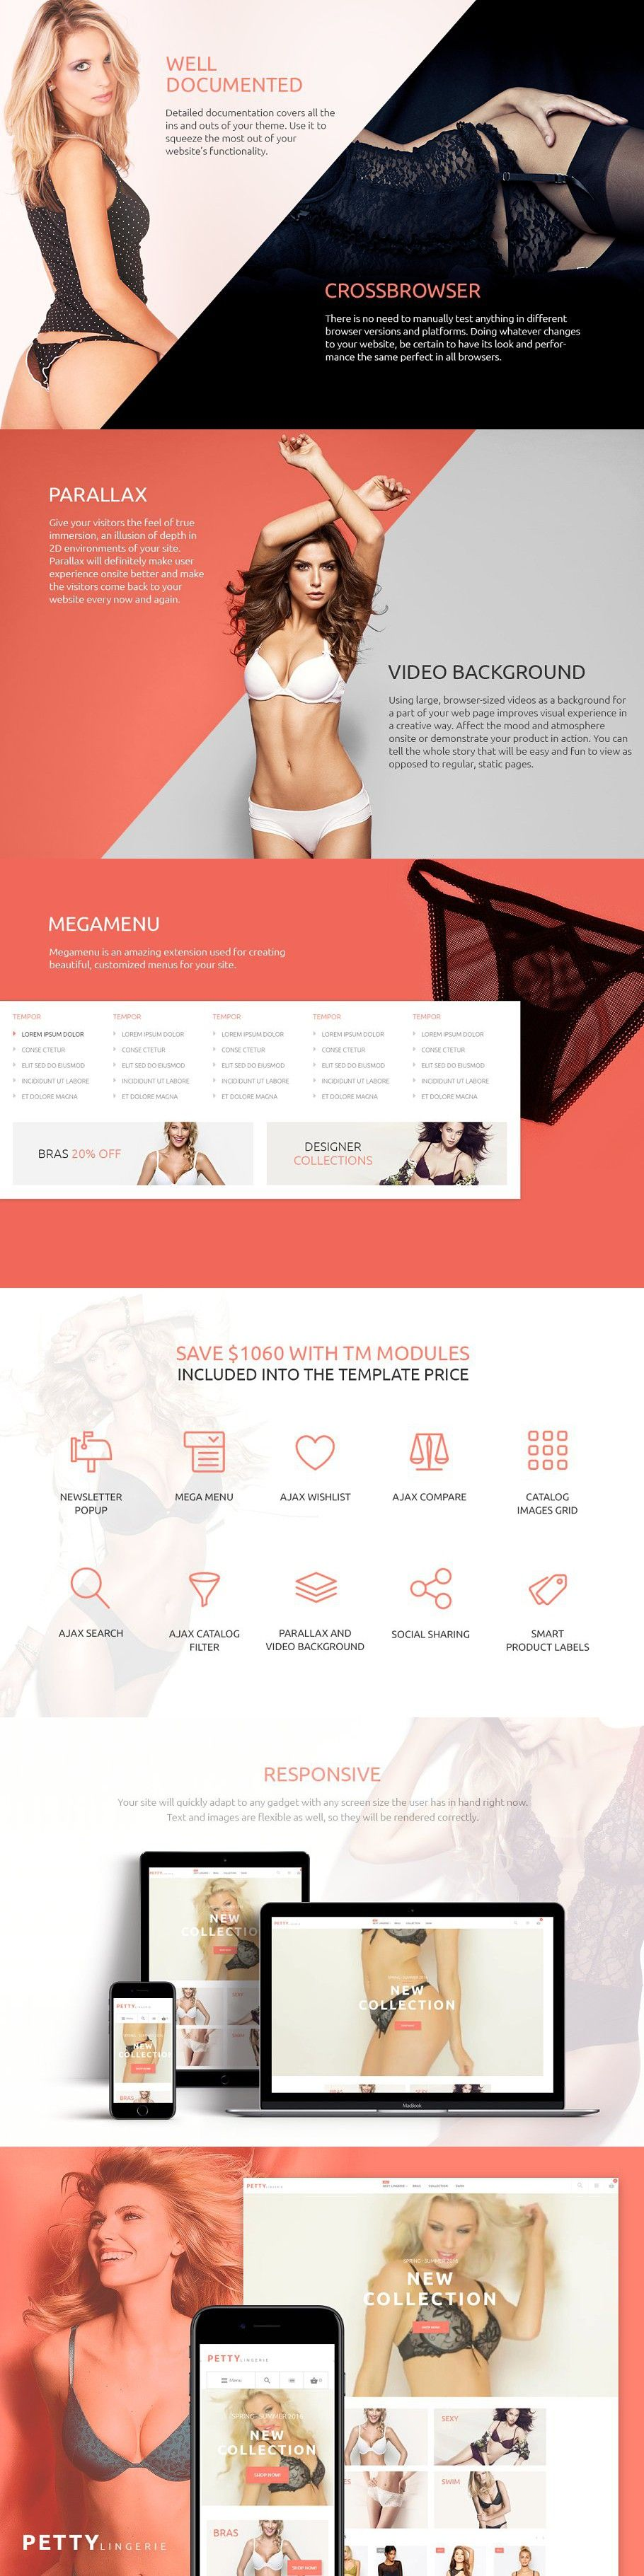 Pin on Web Themes Ideas